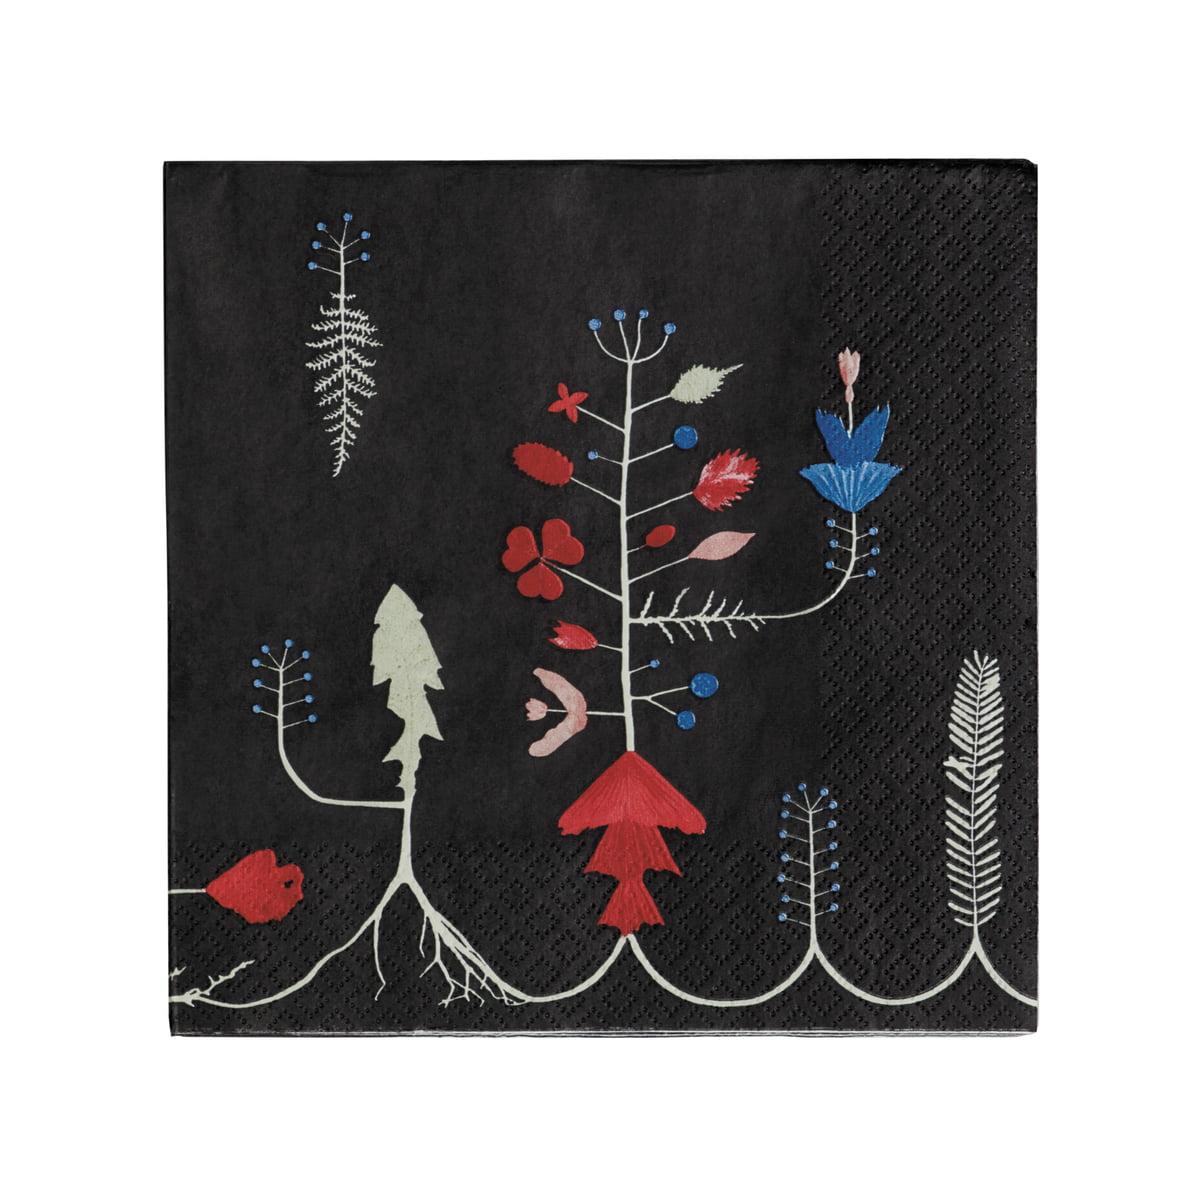 Sarjaton Papier-Serviette 33 x 33 cm, Varpu schwarz